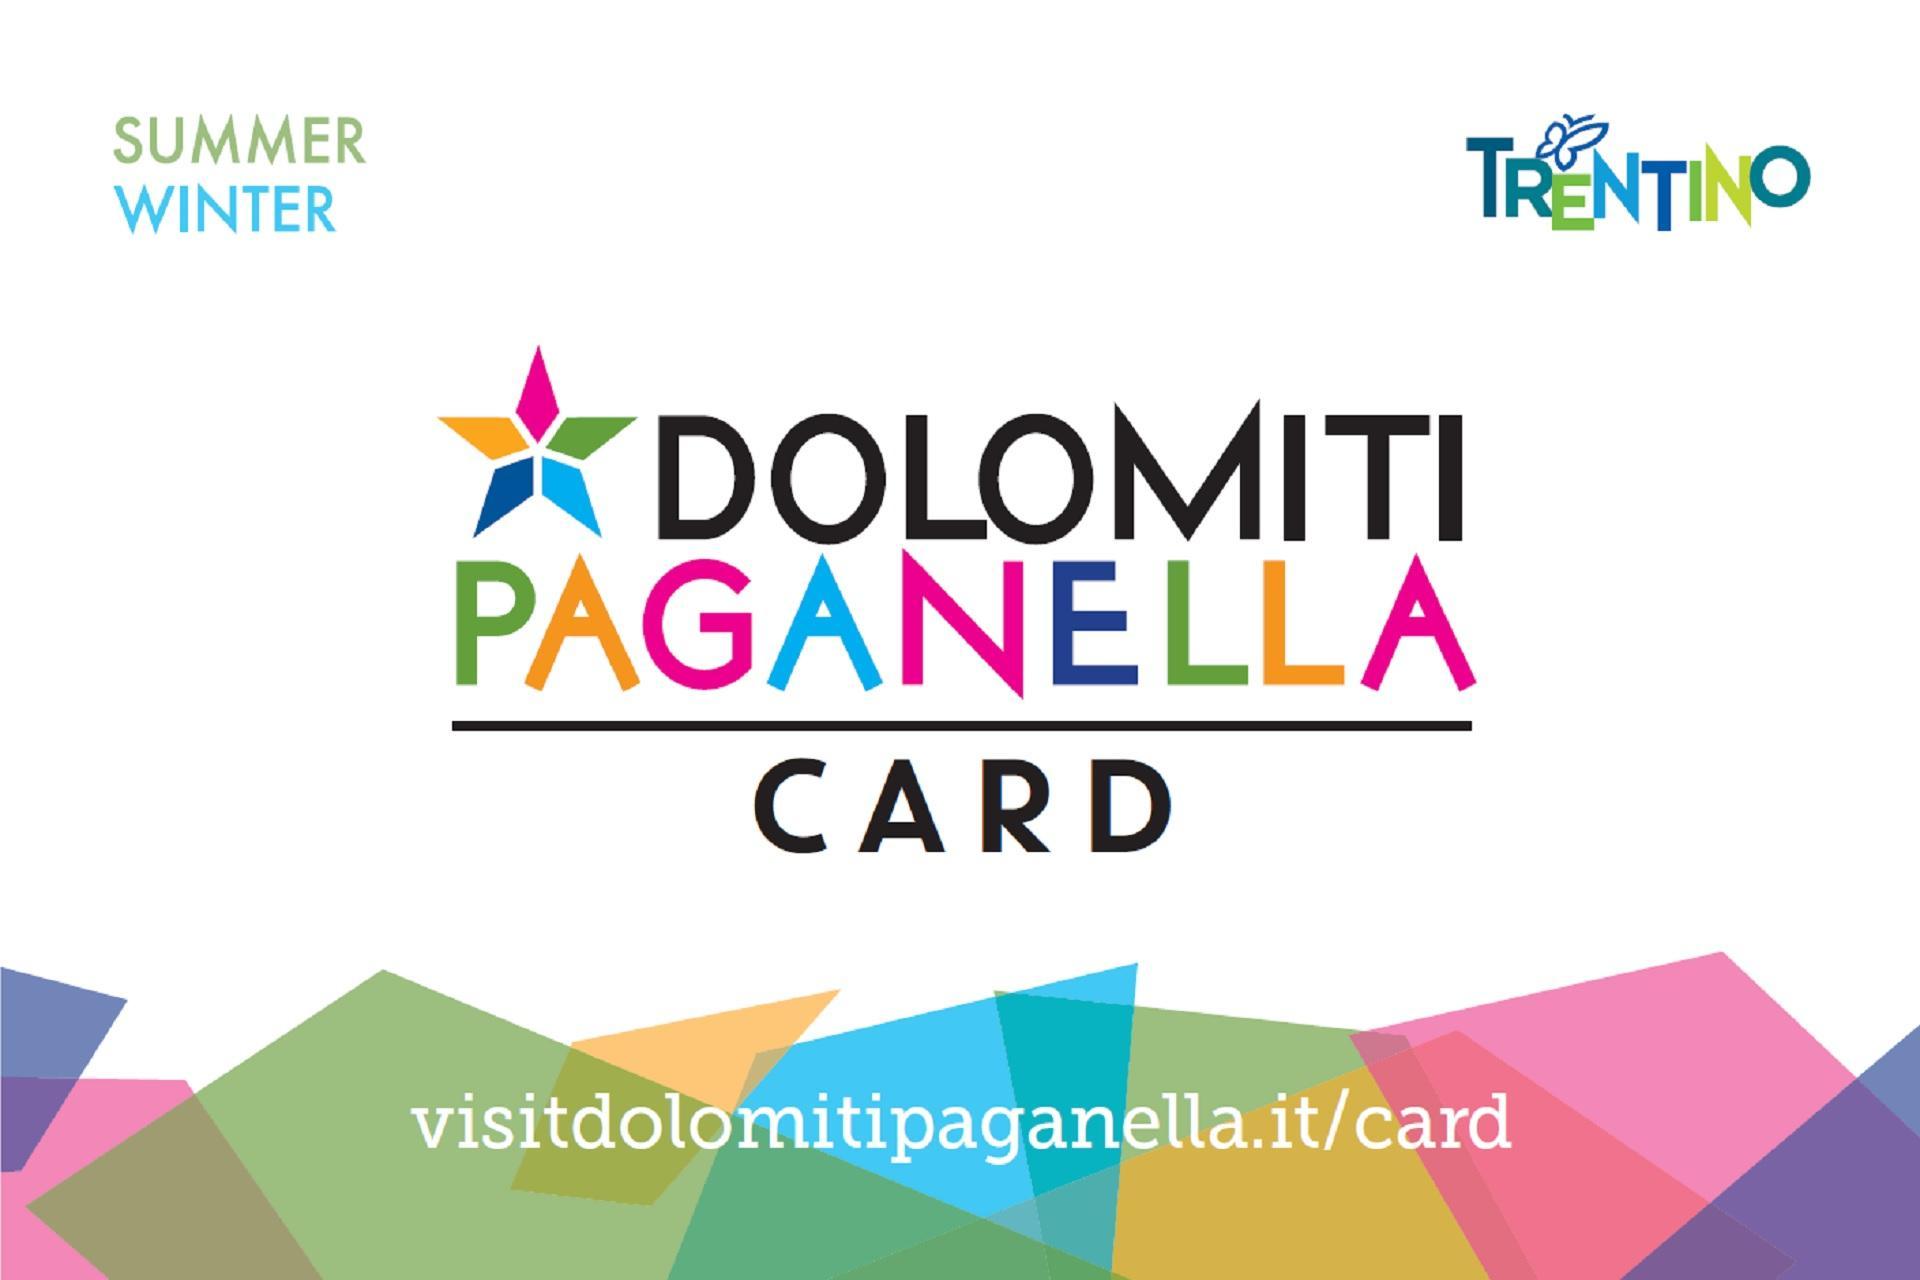 Dolomiti_Paganella_Card.jpg